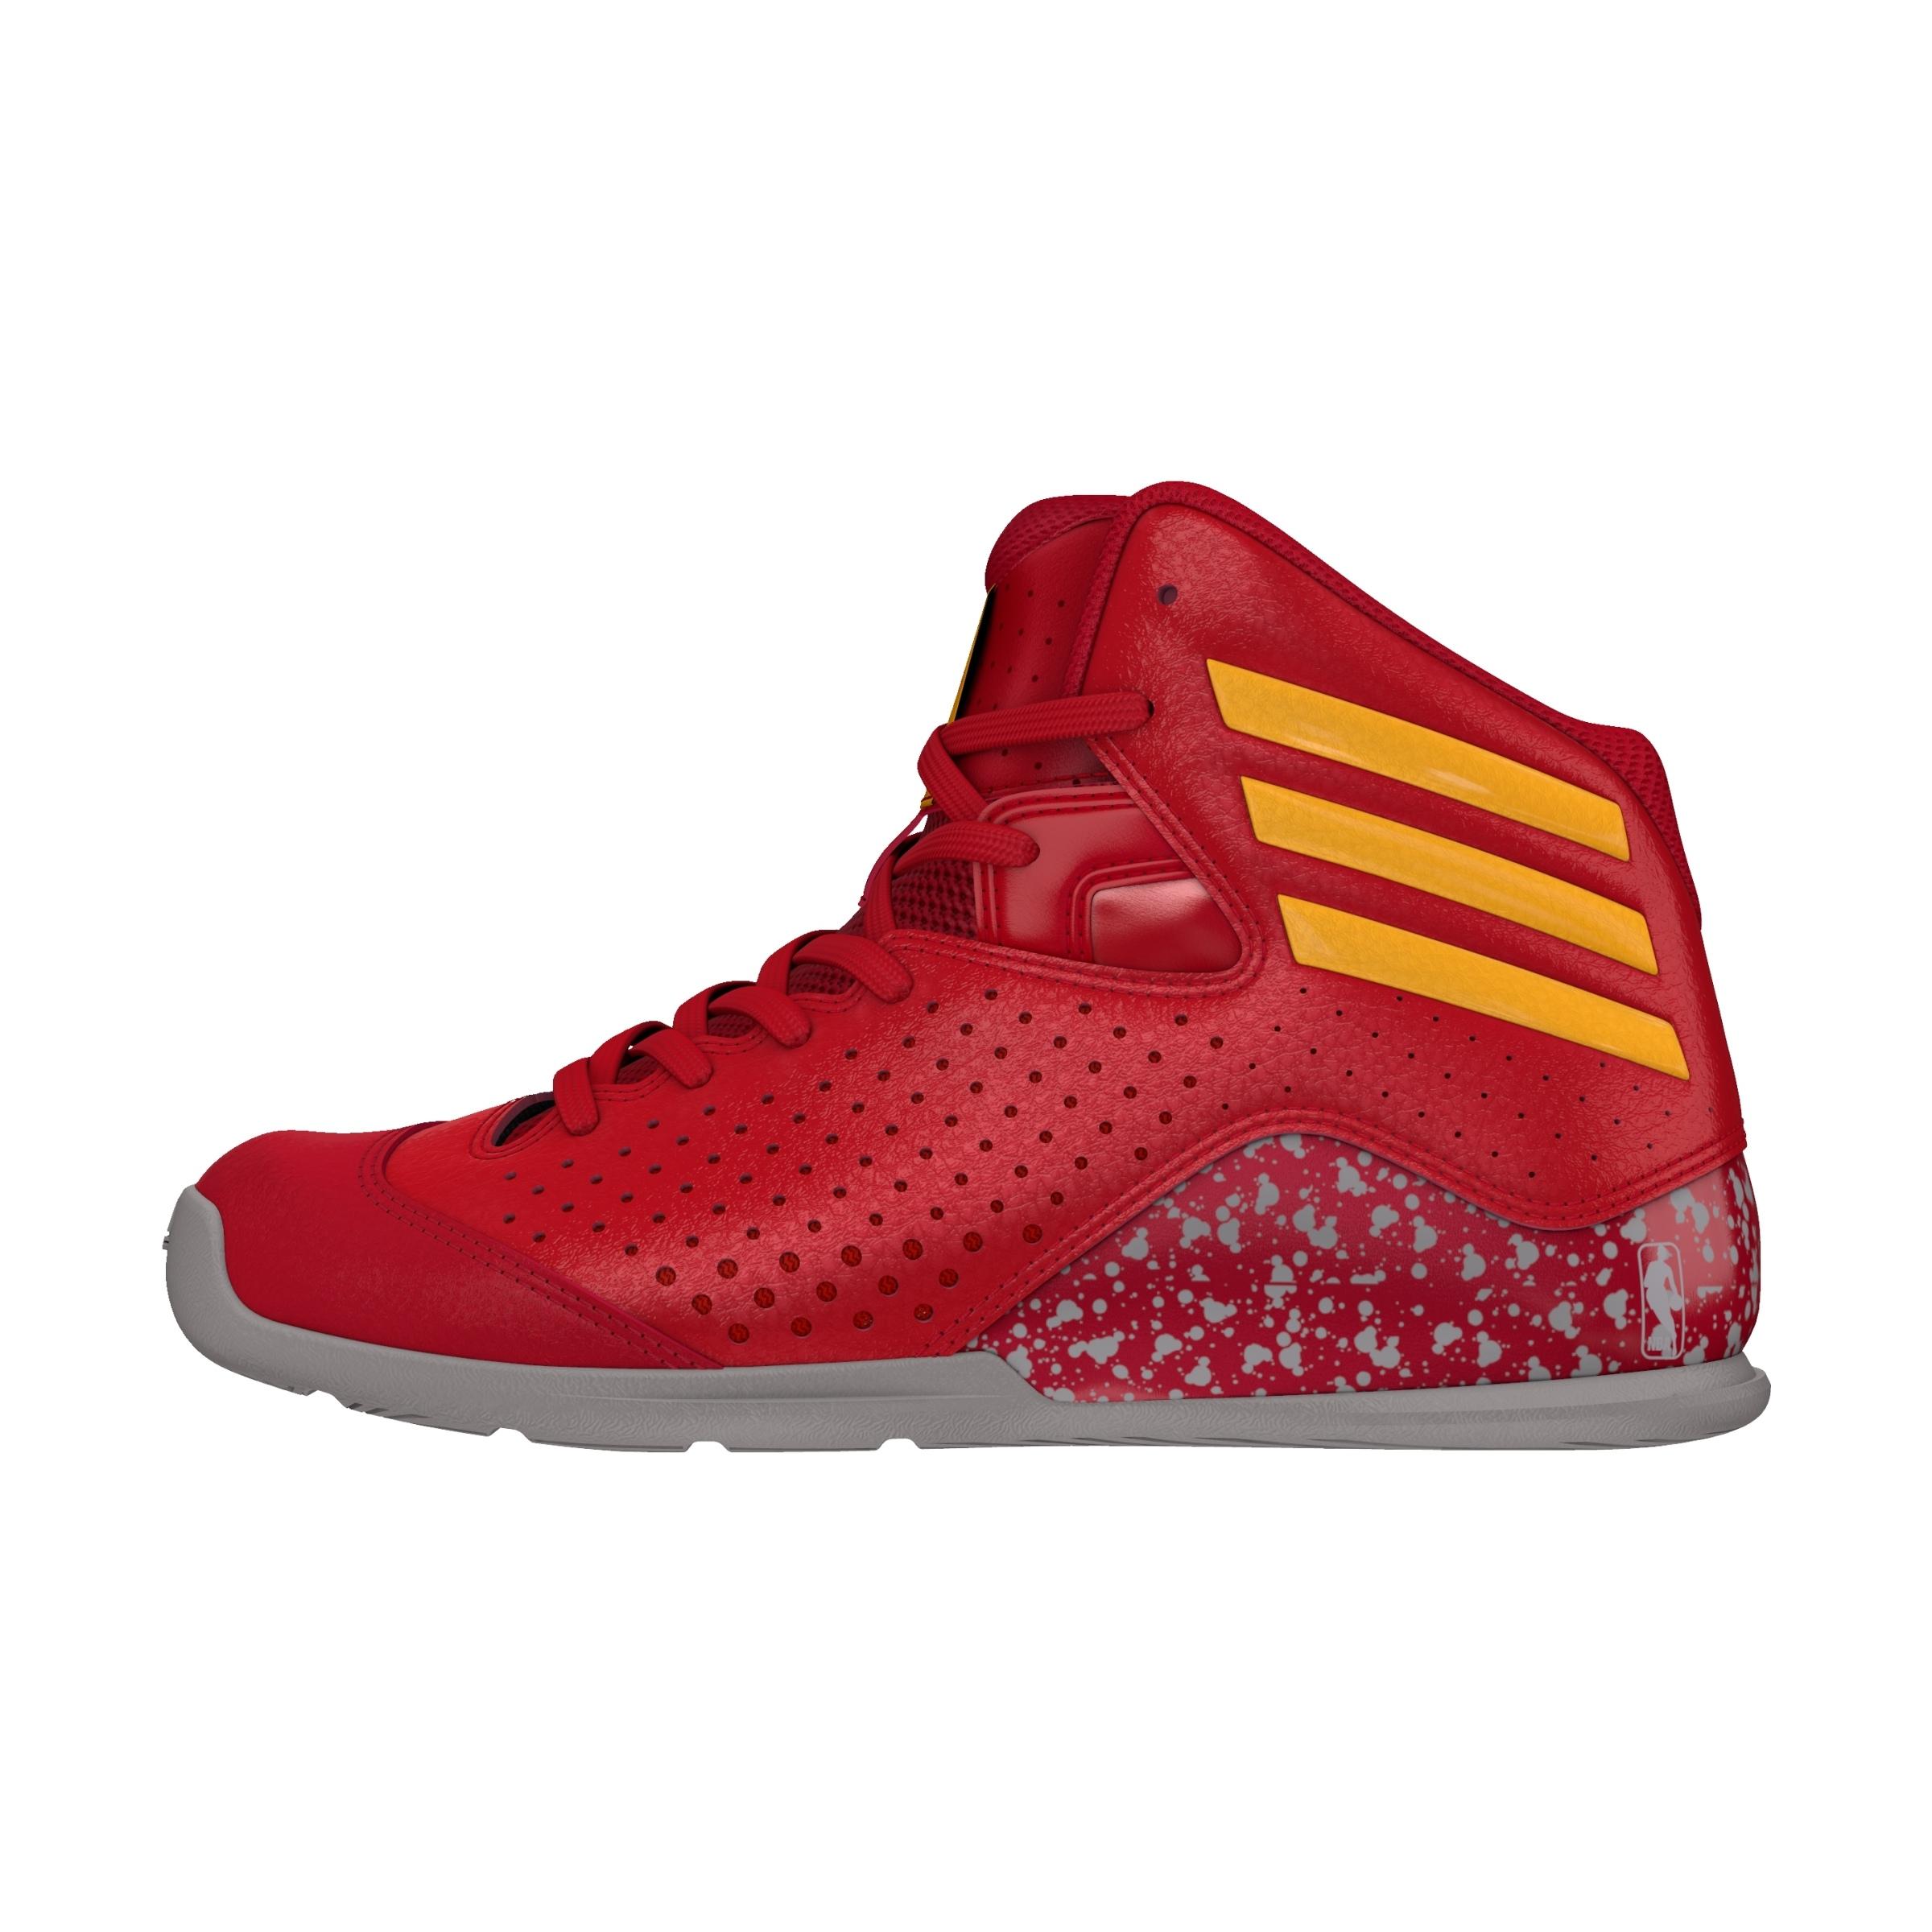 Zapatos Adidas All Star Rojos